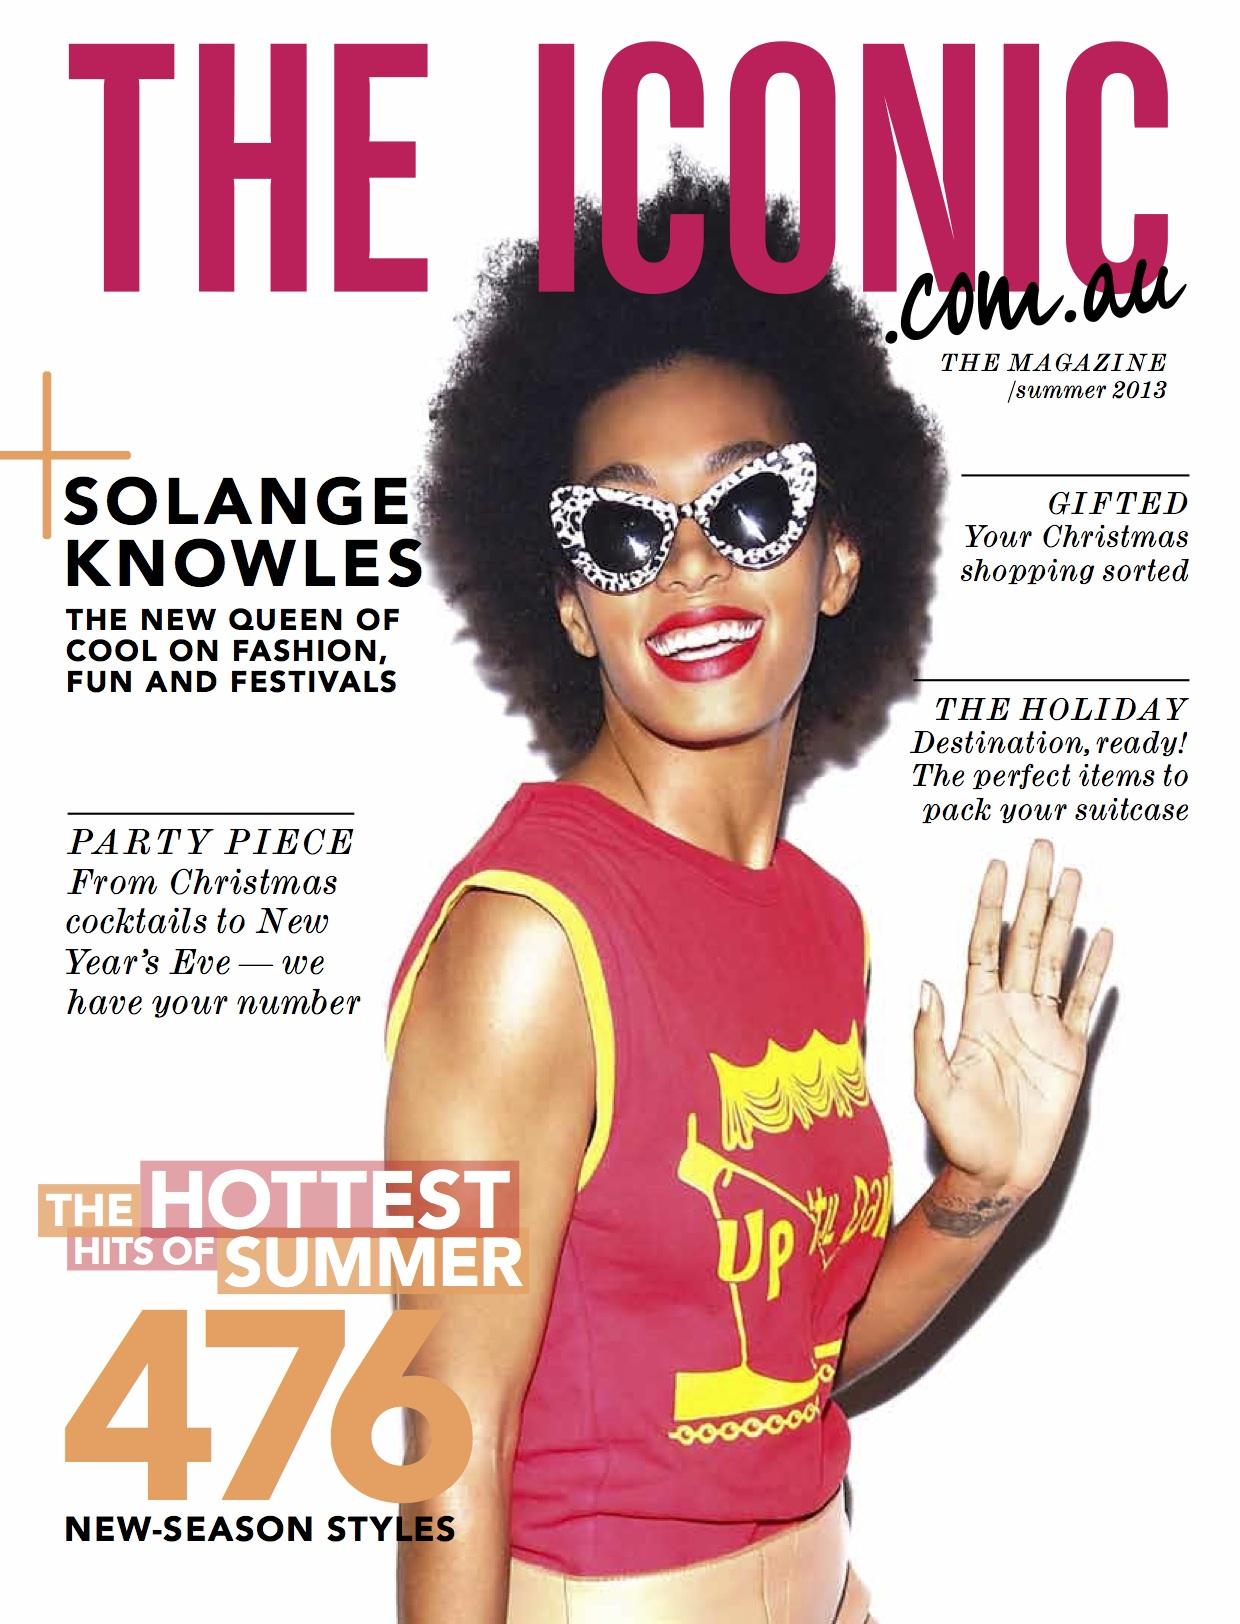 The Iconic magazine